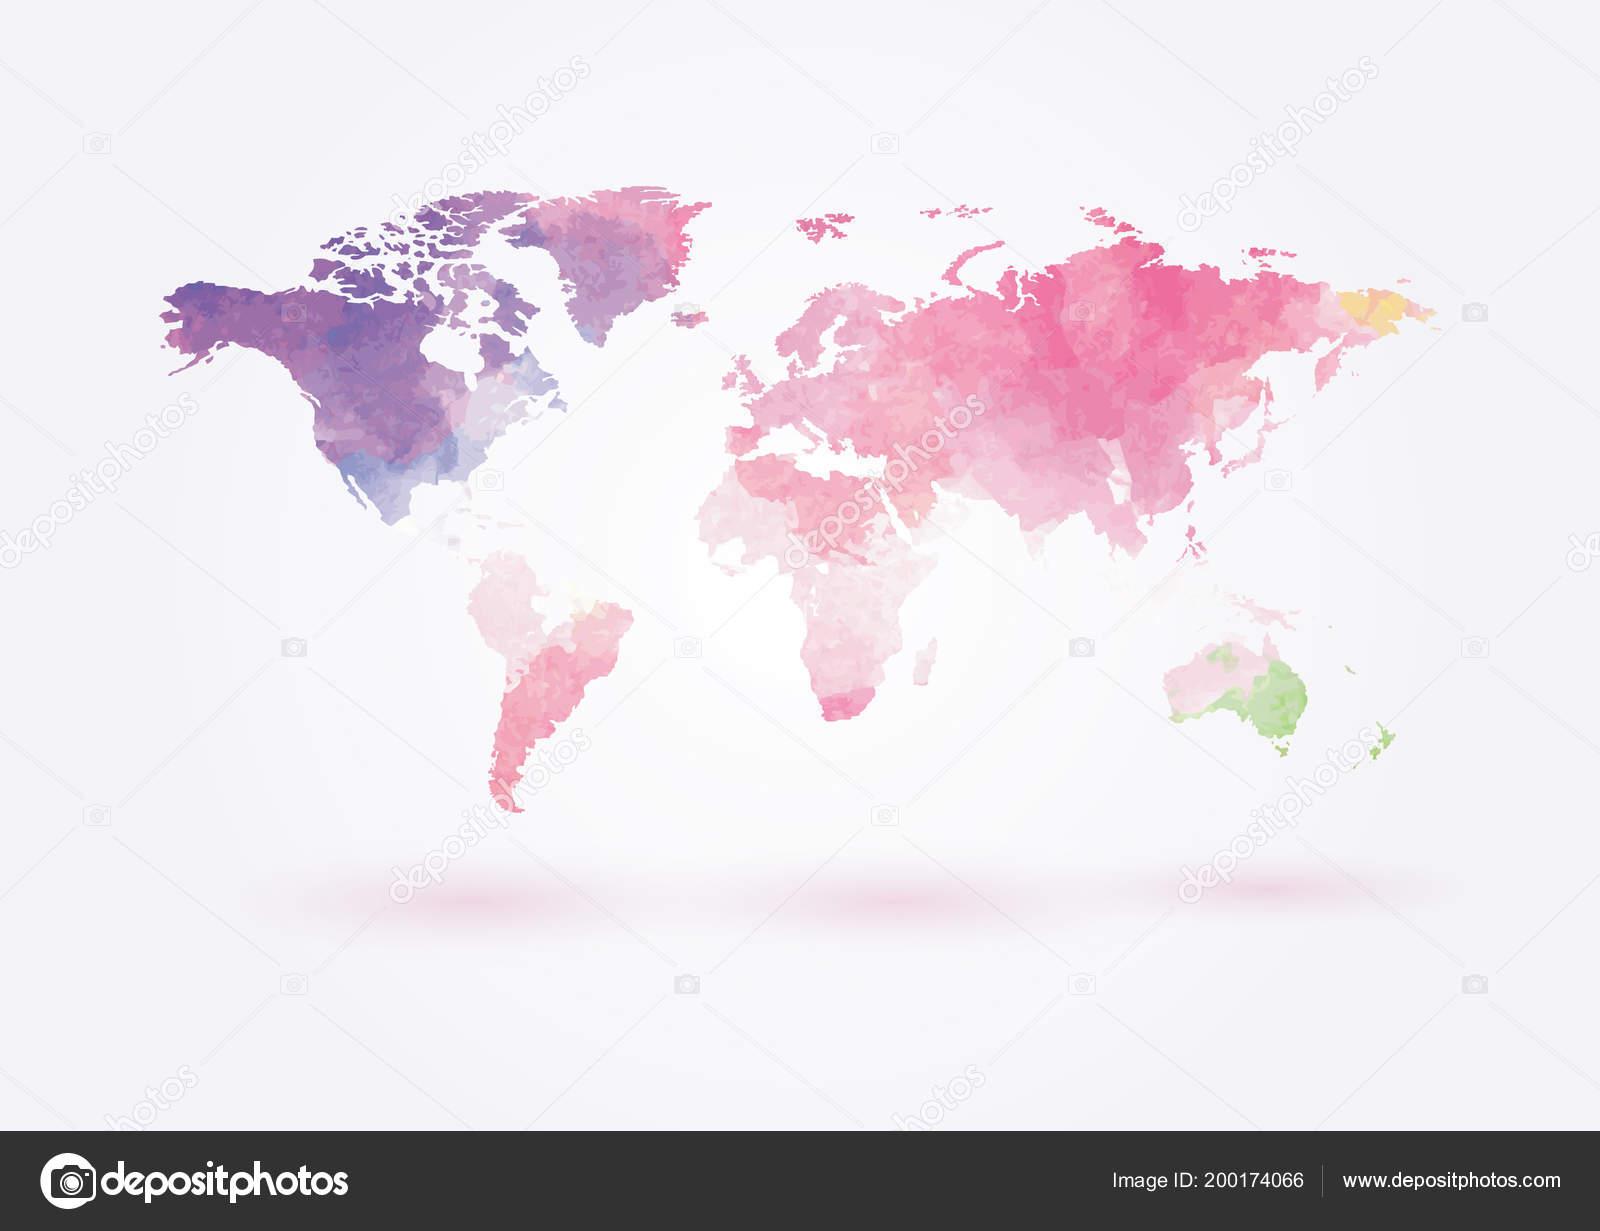 Vector world map watercolor style vector de stock brazzik 200174066 vector world map in watercolor style vector de brazzik gumiabroncs Images